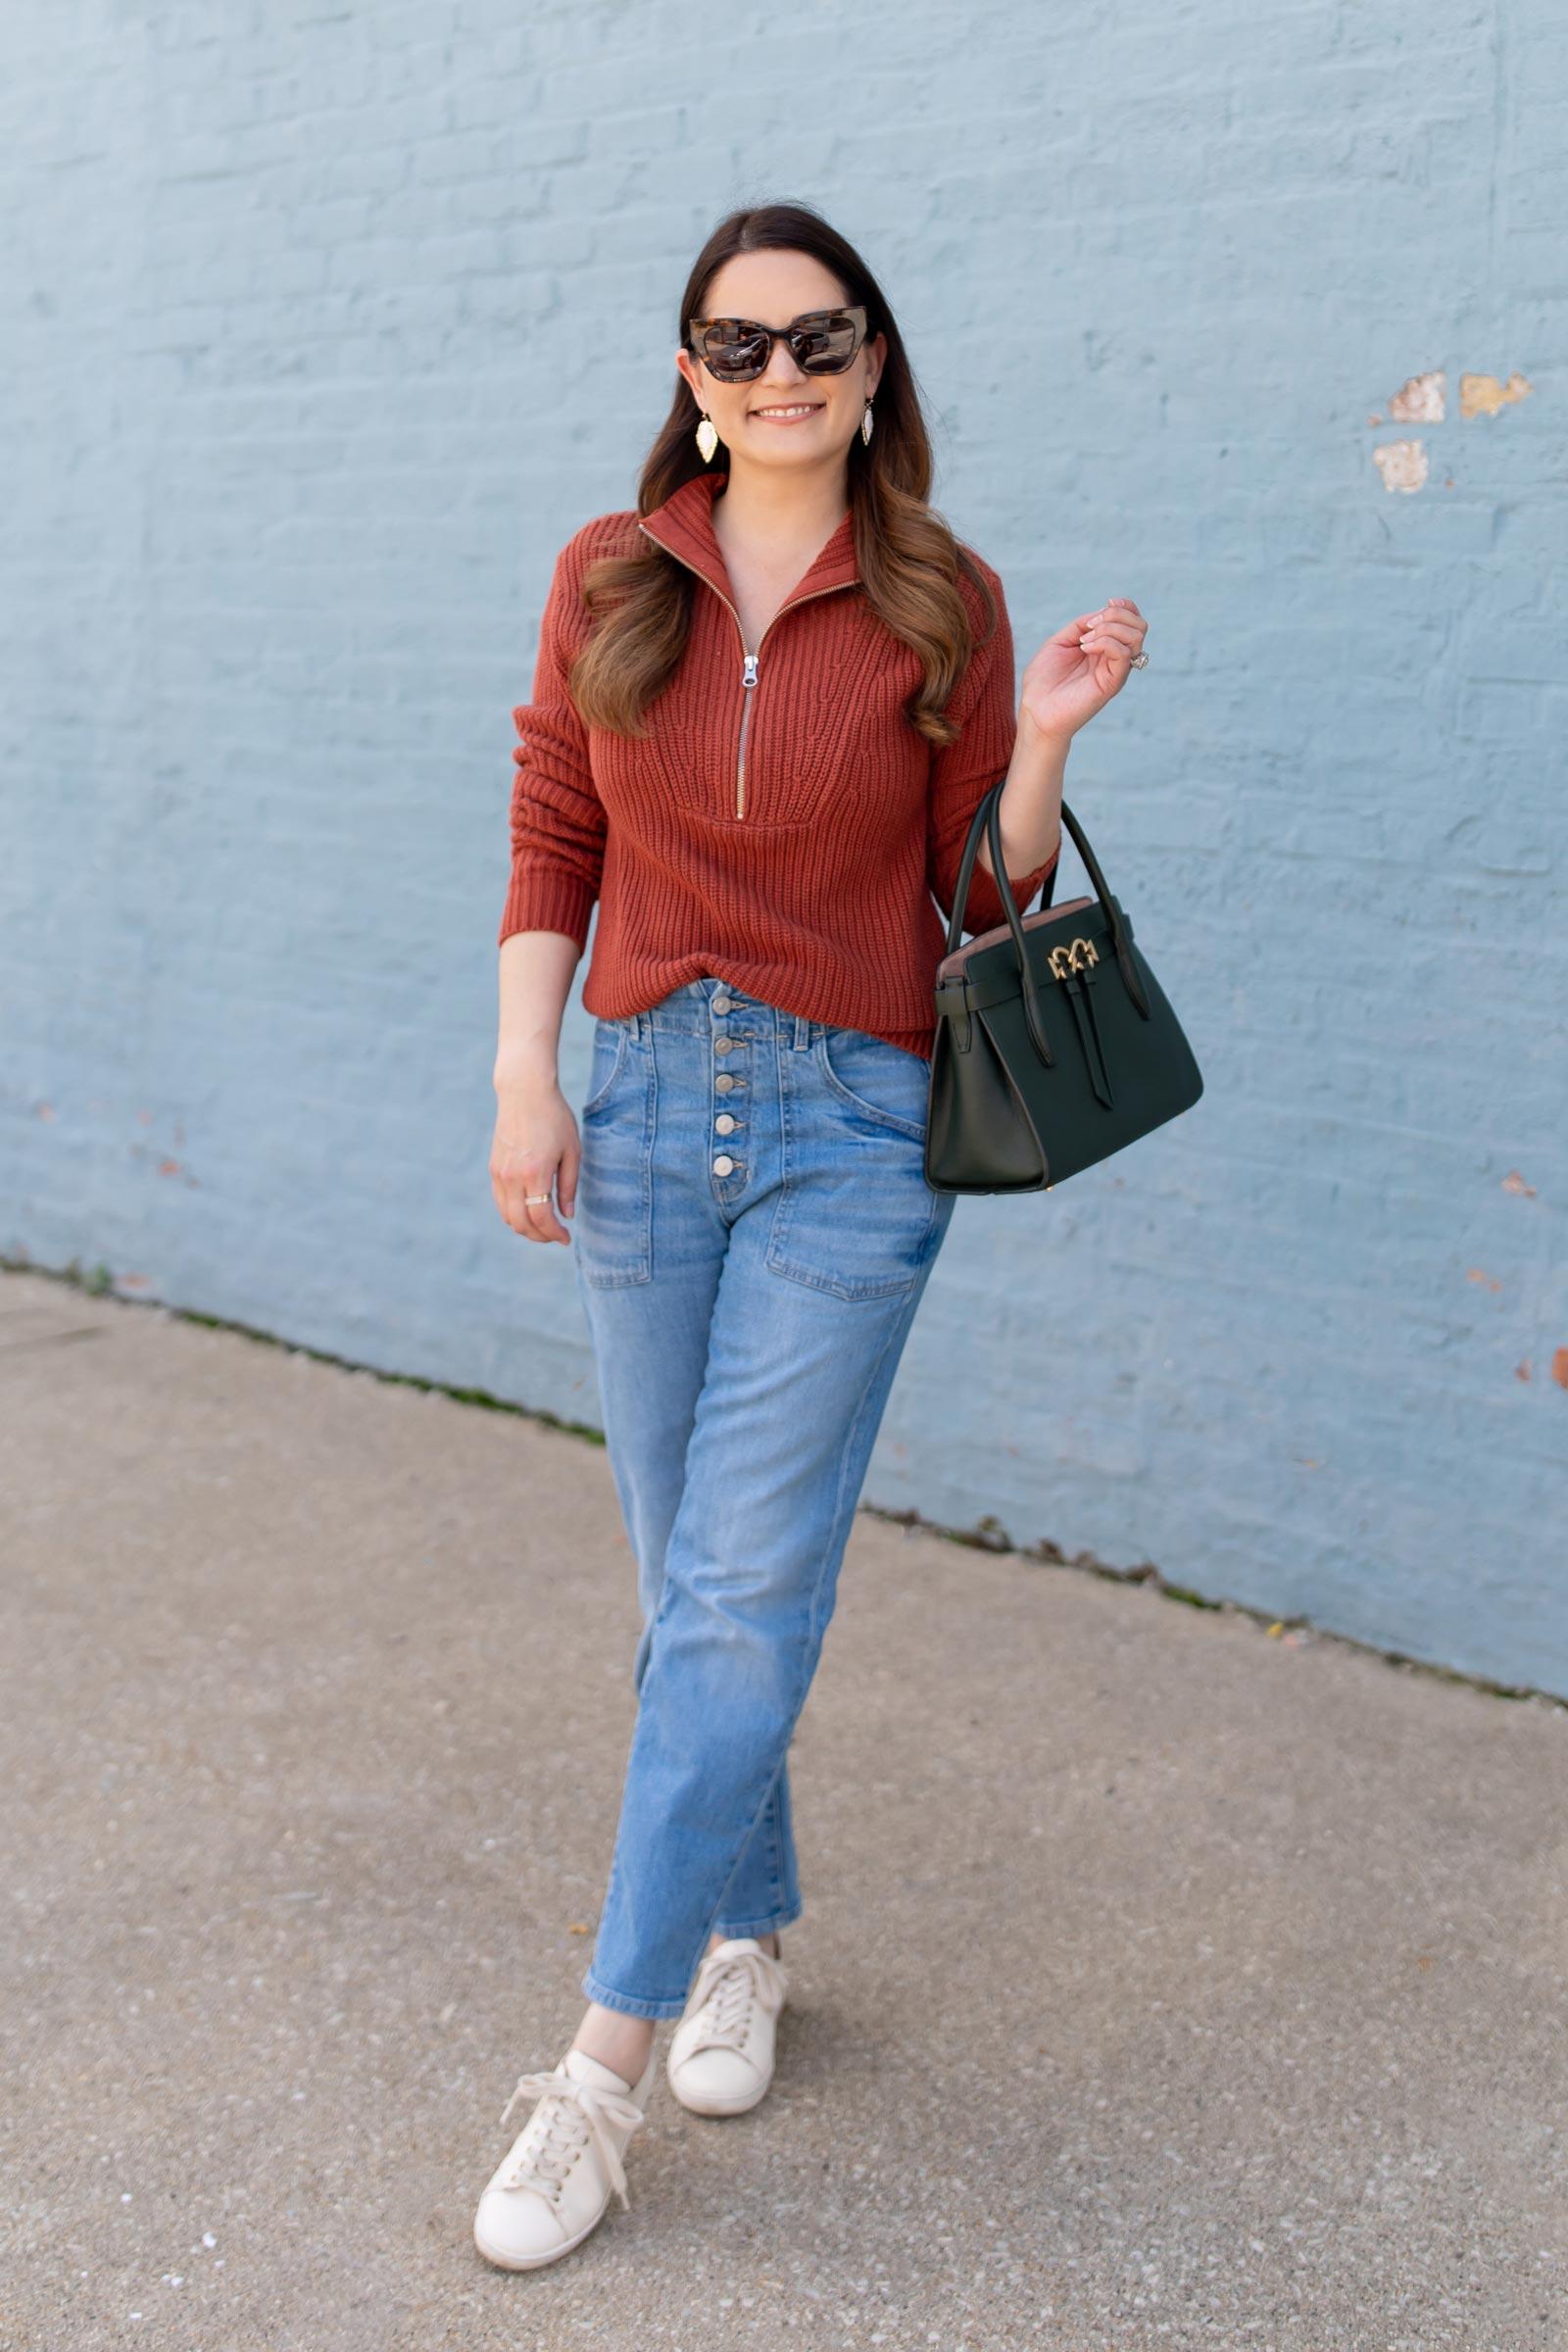 Jennifer Lake Veronica Beard Half-Zip Sweater